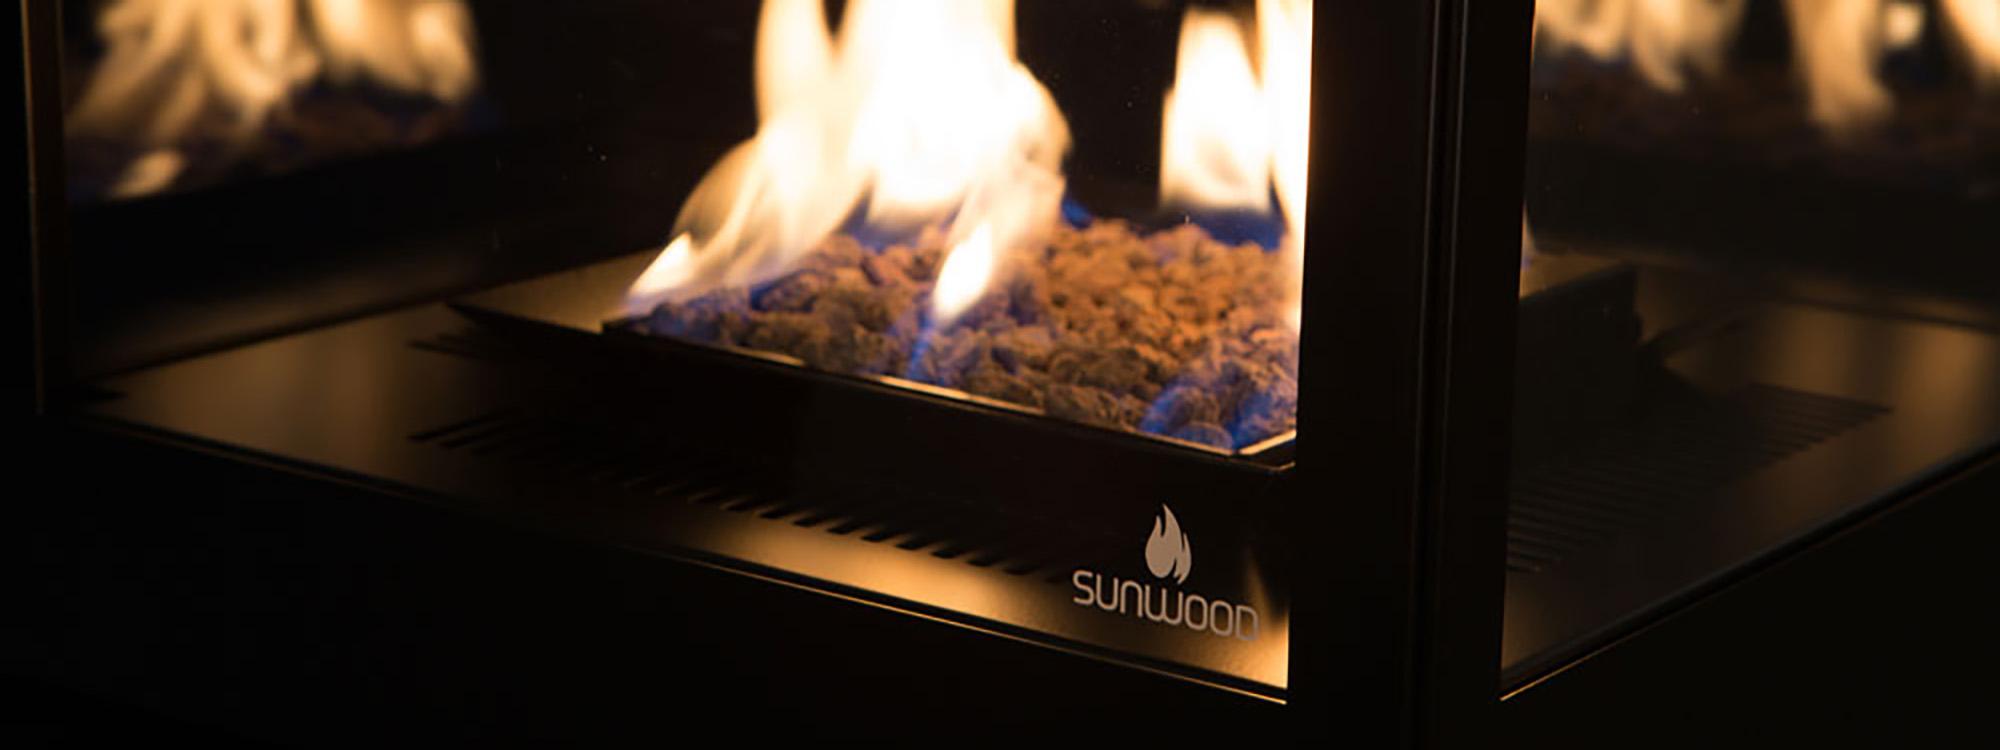 sunwood marino gaskaminofen hotels event location terrasse. Black Bedroom Furniture Sets. Home Design Ideas